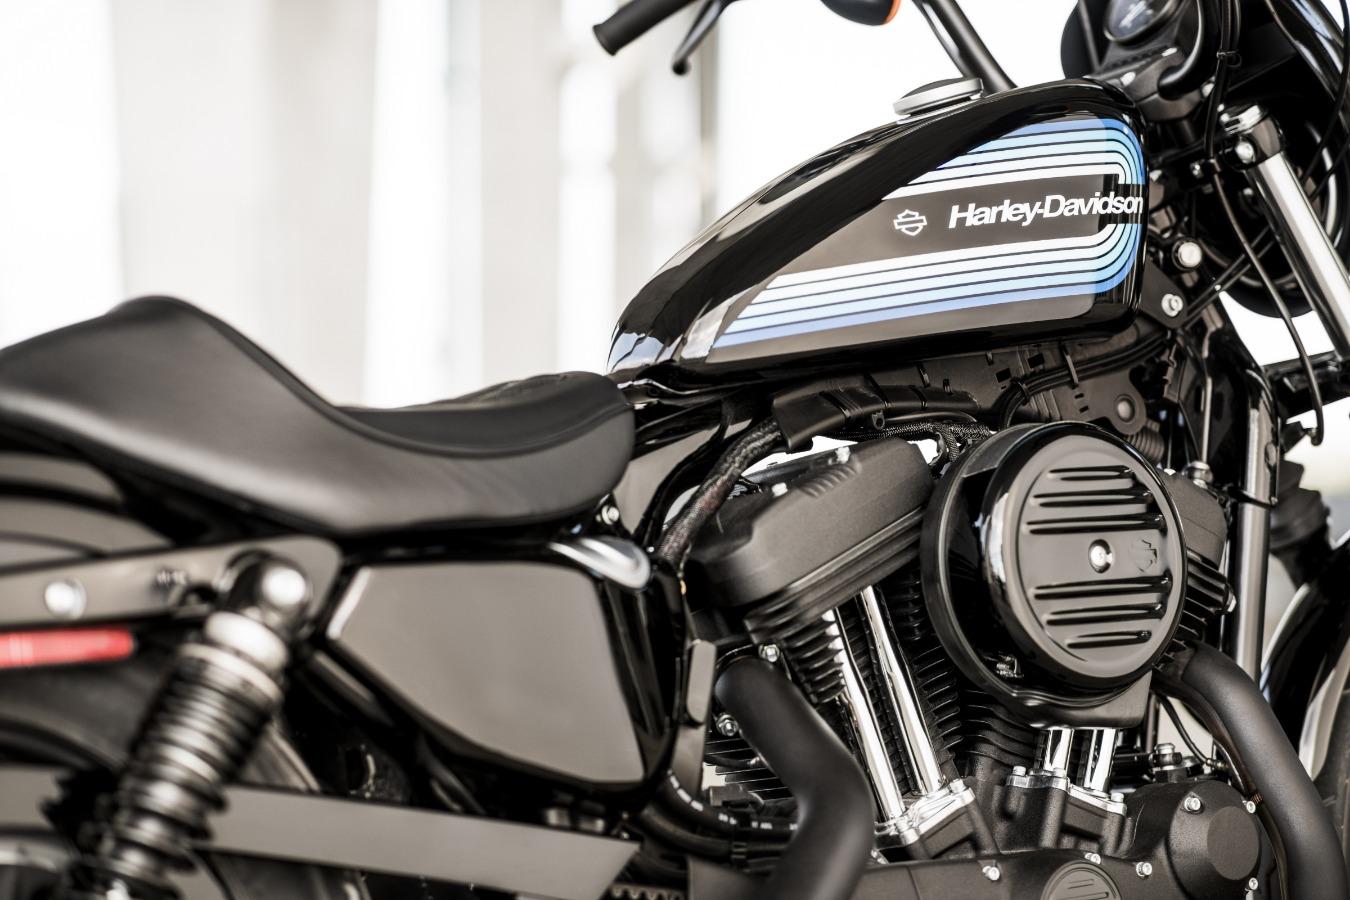 Harley-Davidson Ravenna IRON 1200